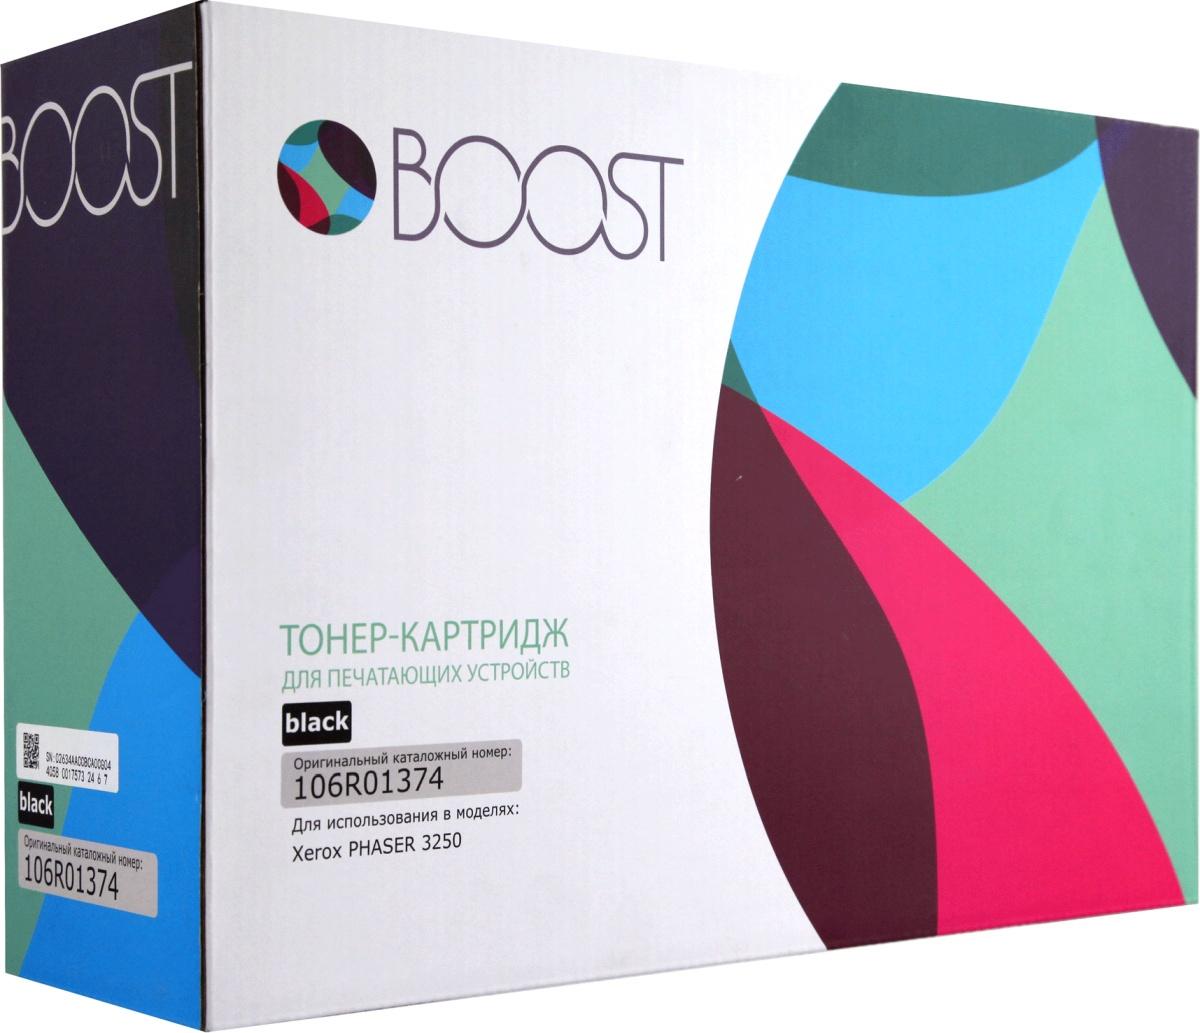 Boost 106R01374, Черный тонер-картридж для Xerox Phaser 3250/3250D/3250DN